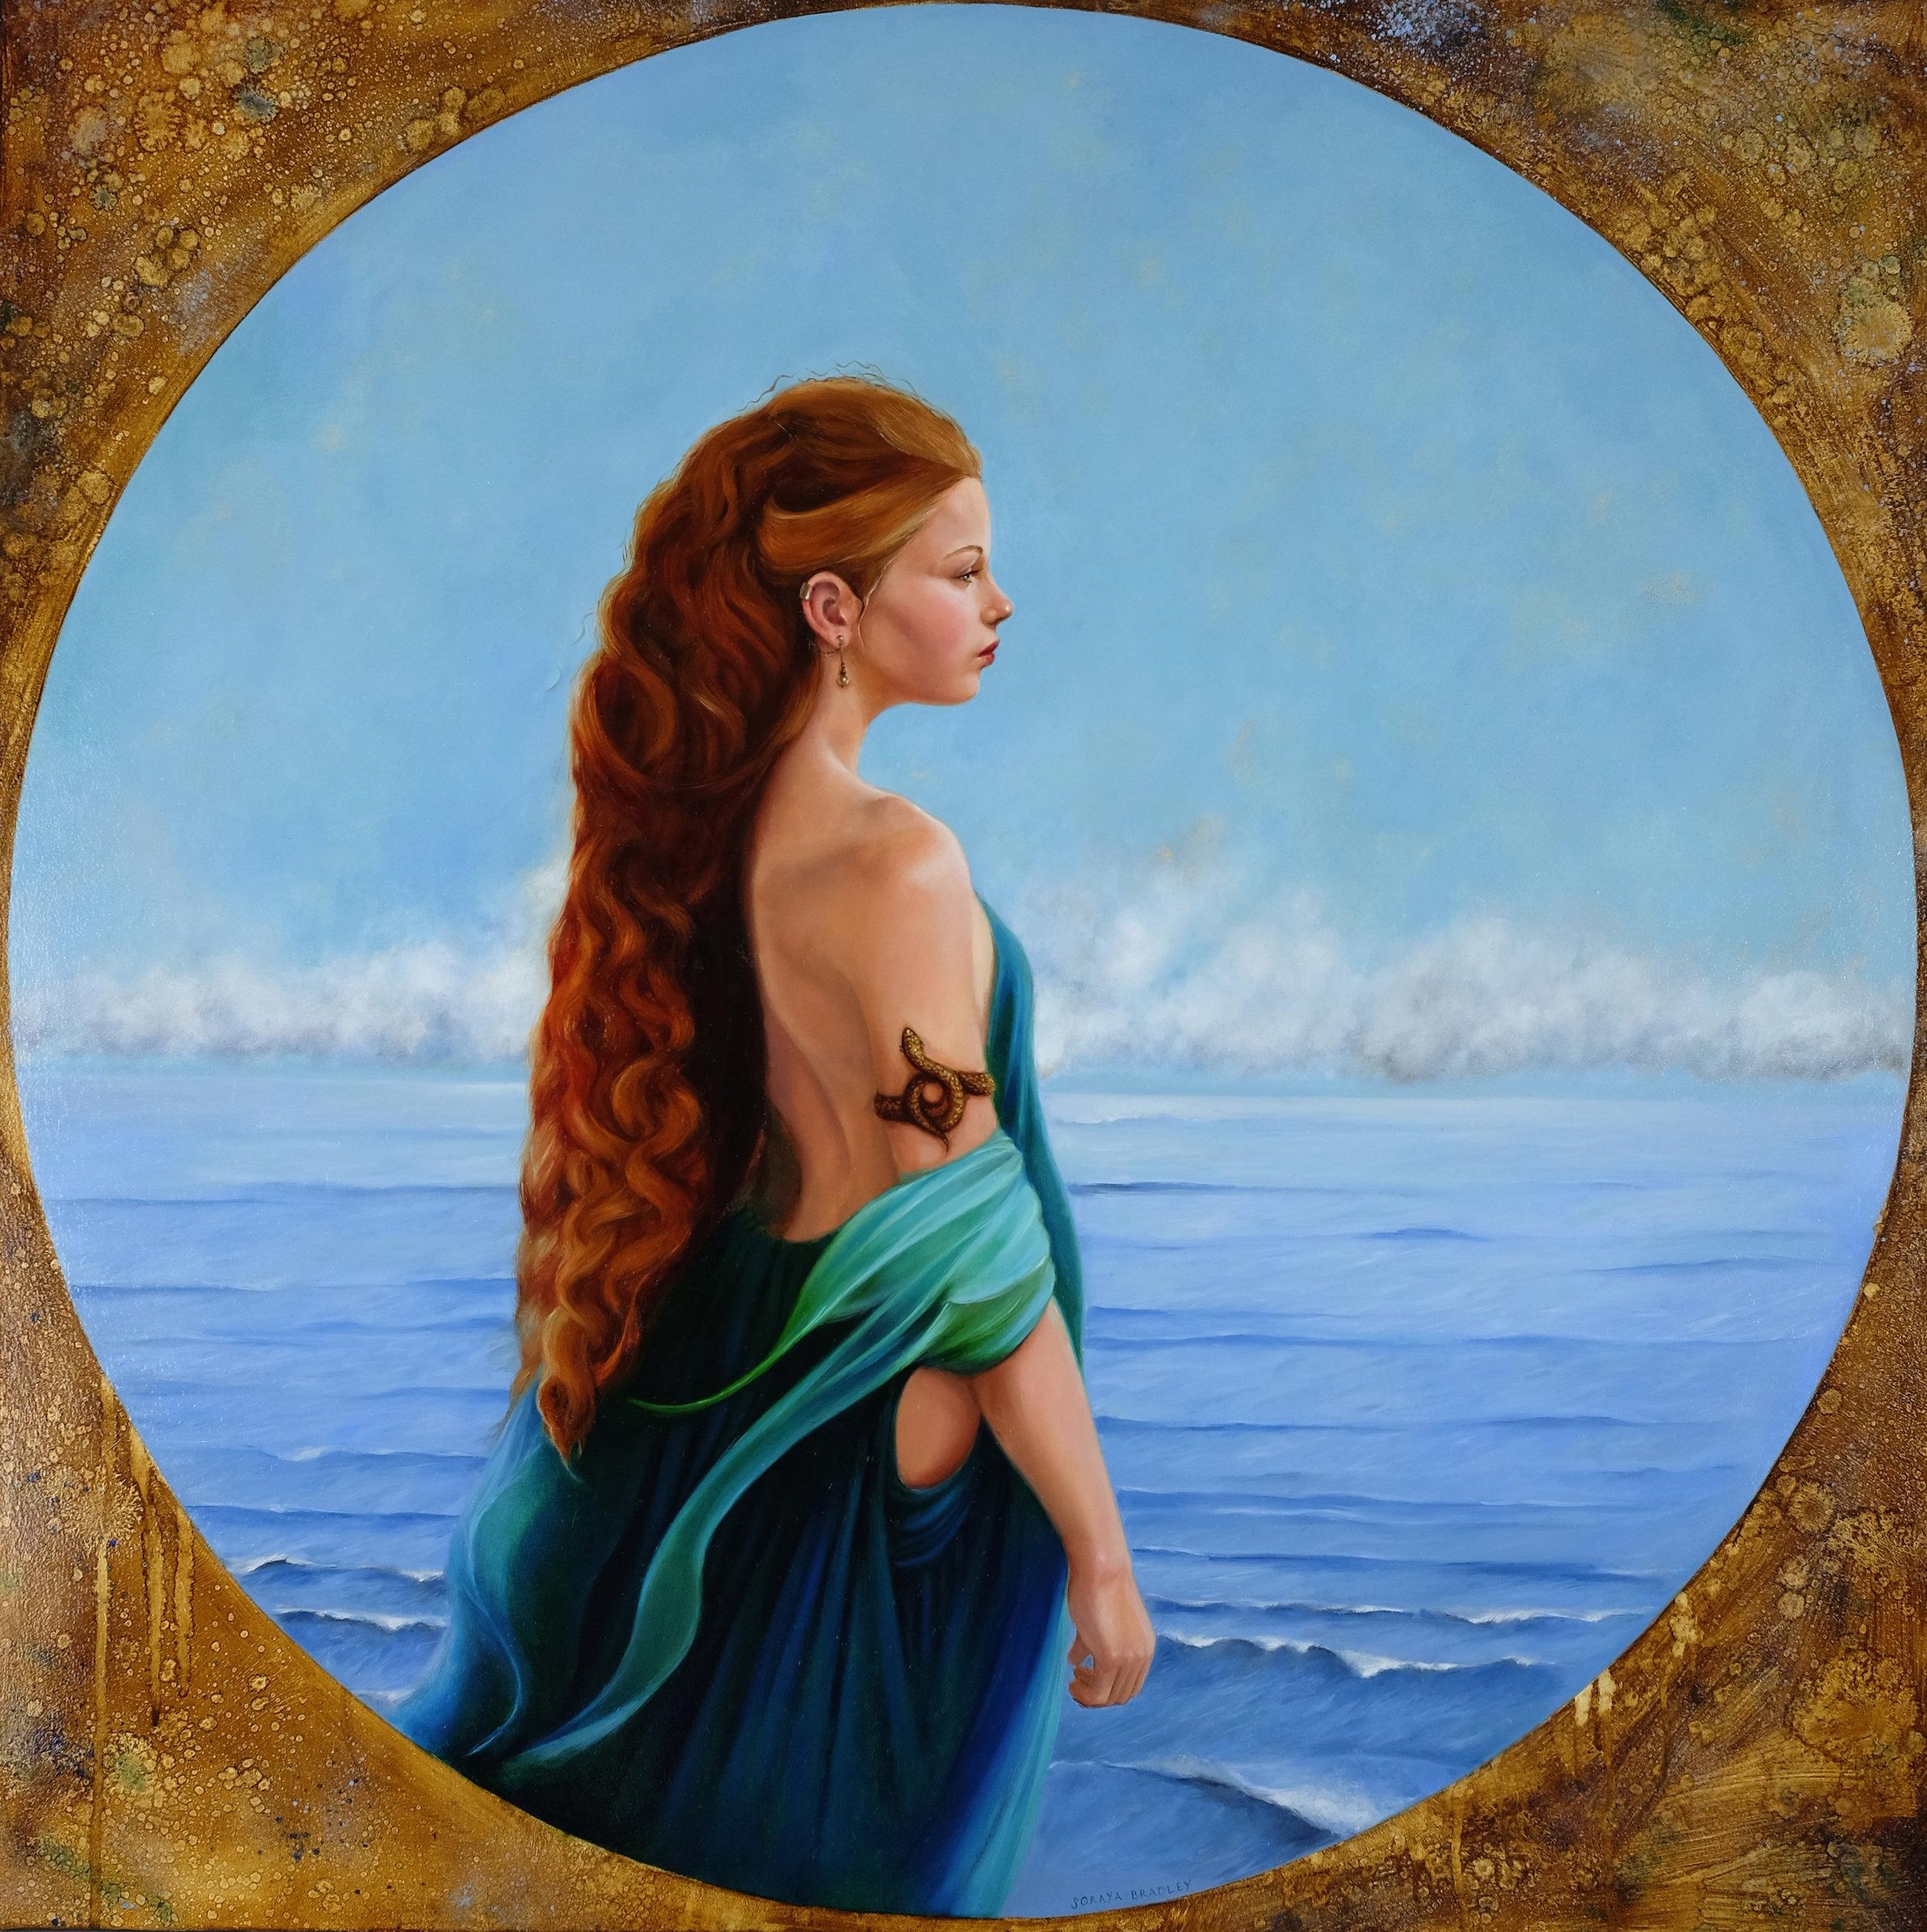 Beyond the Sea by Soraya Bradley